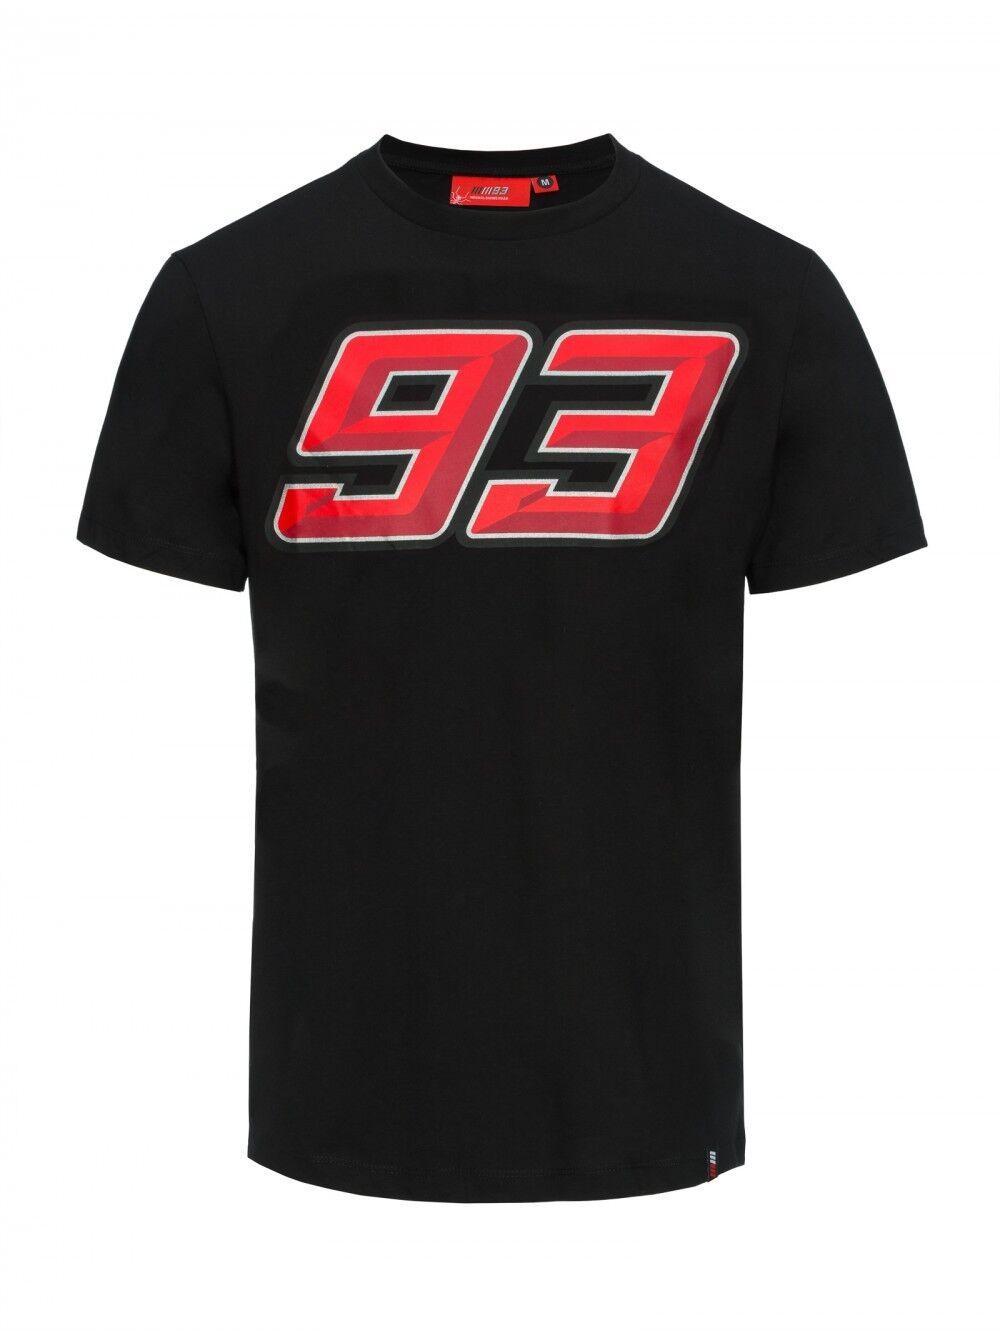 MARC MARQUEZ UFFICIALE 93 T-shirt nera - mmmts 18 33009